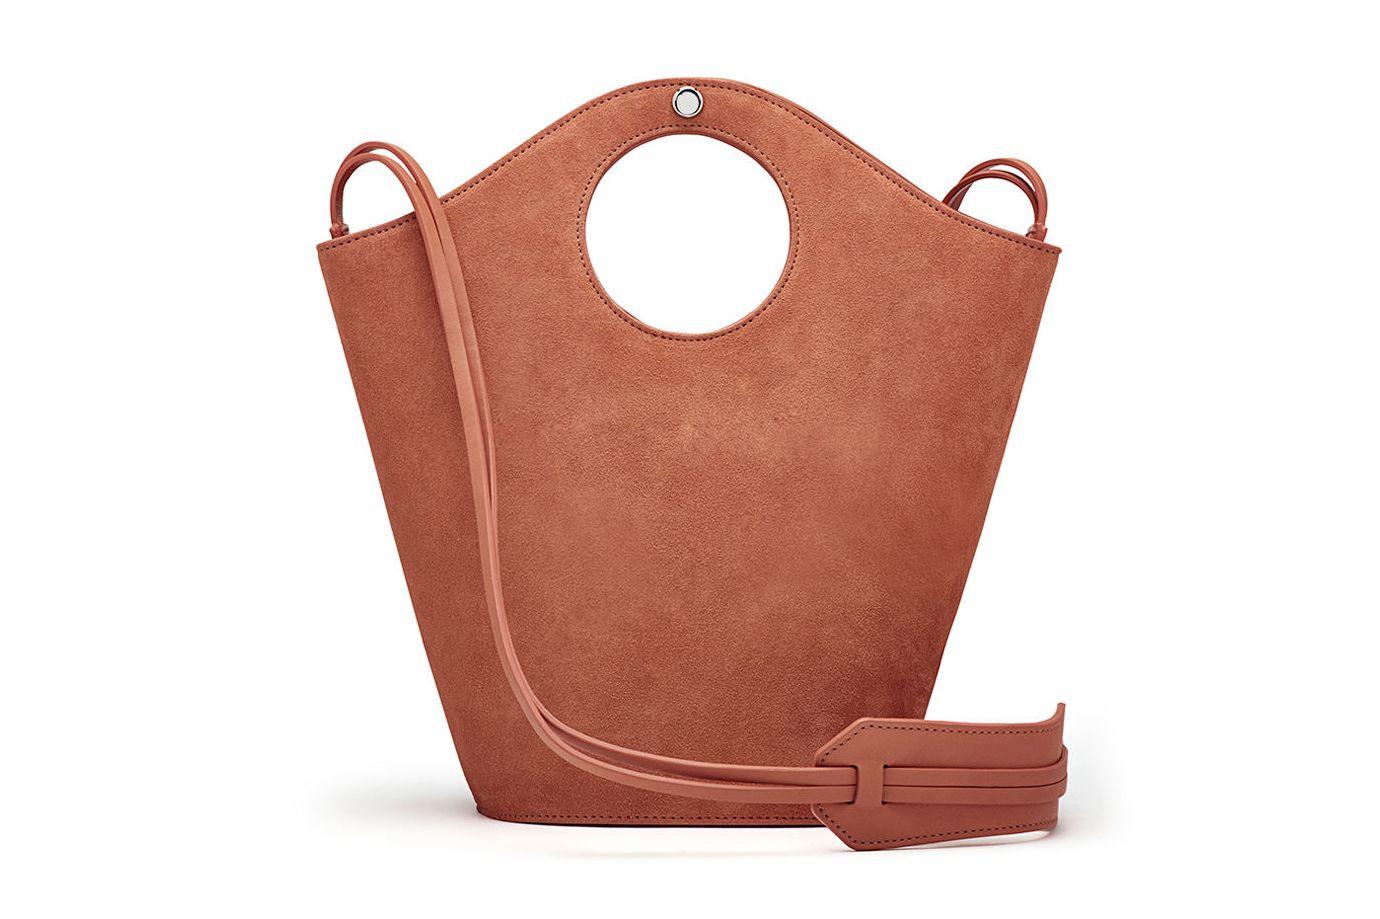 Elizabeth and James Market Small Suede Shopper Tote Bag